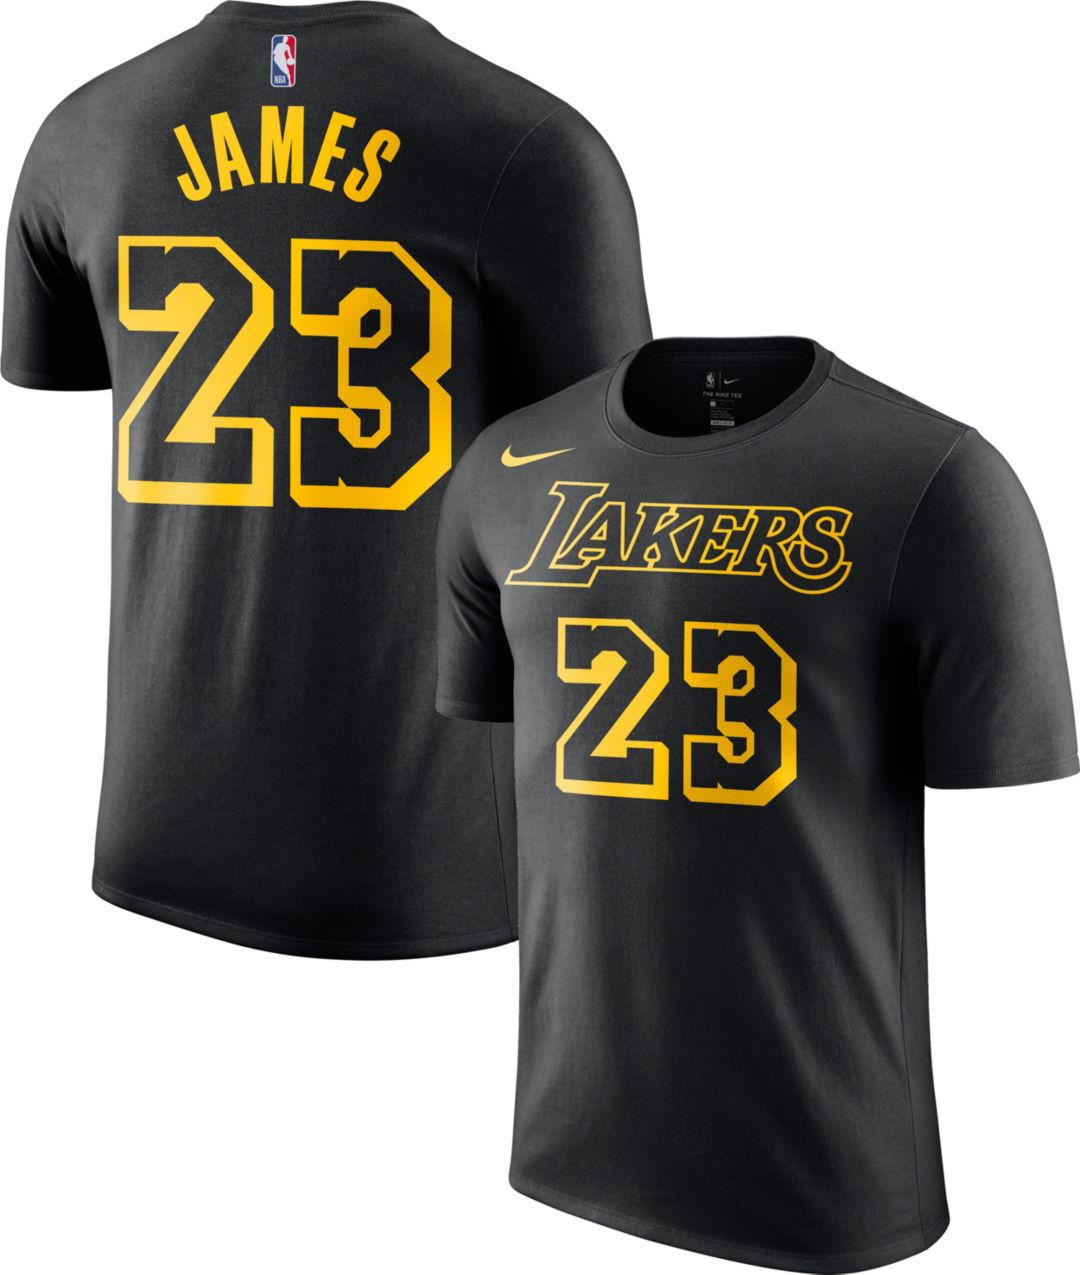 215e33159fe29 Nike Youth Los Angeles Lakers LeBron James Dri-FIT City Edition T-Shirt 1